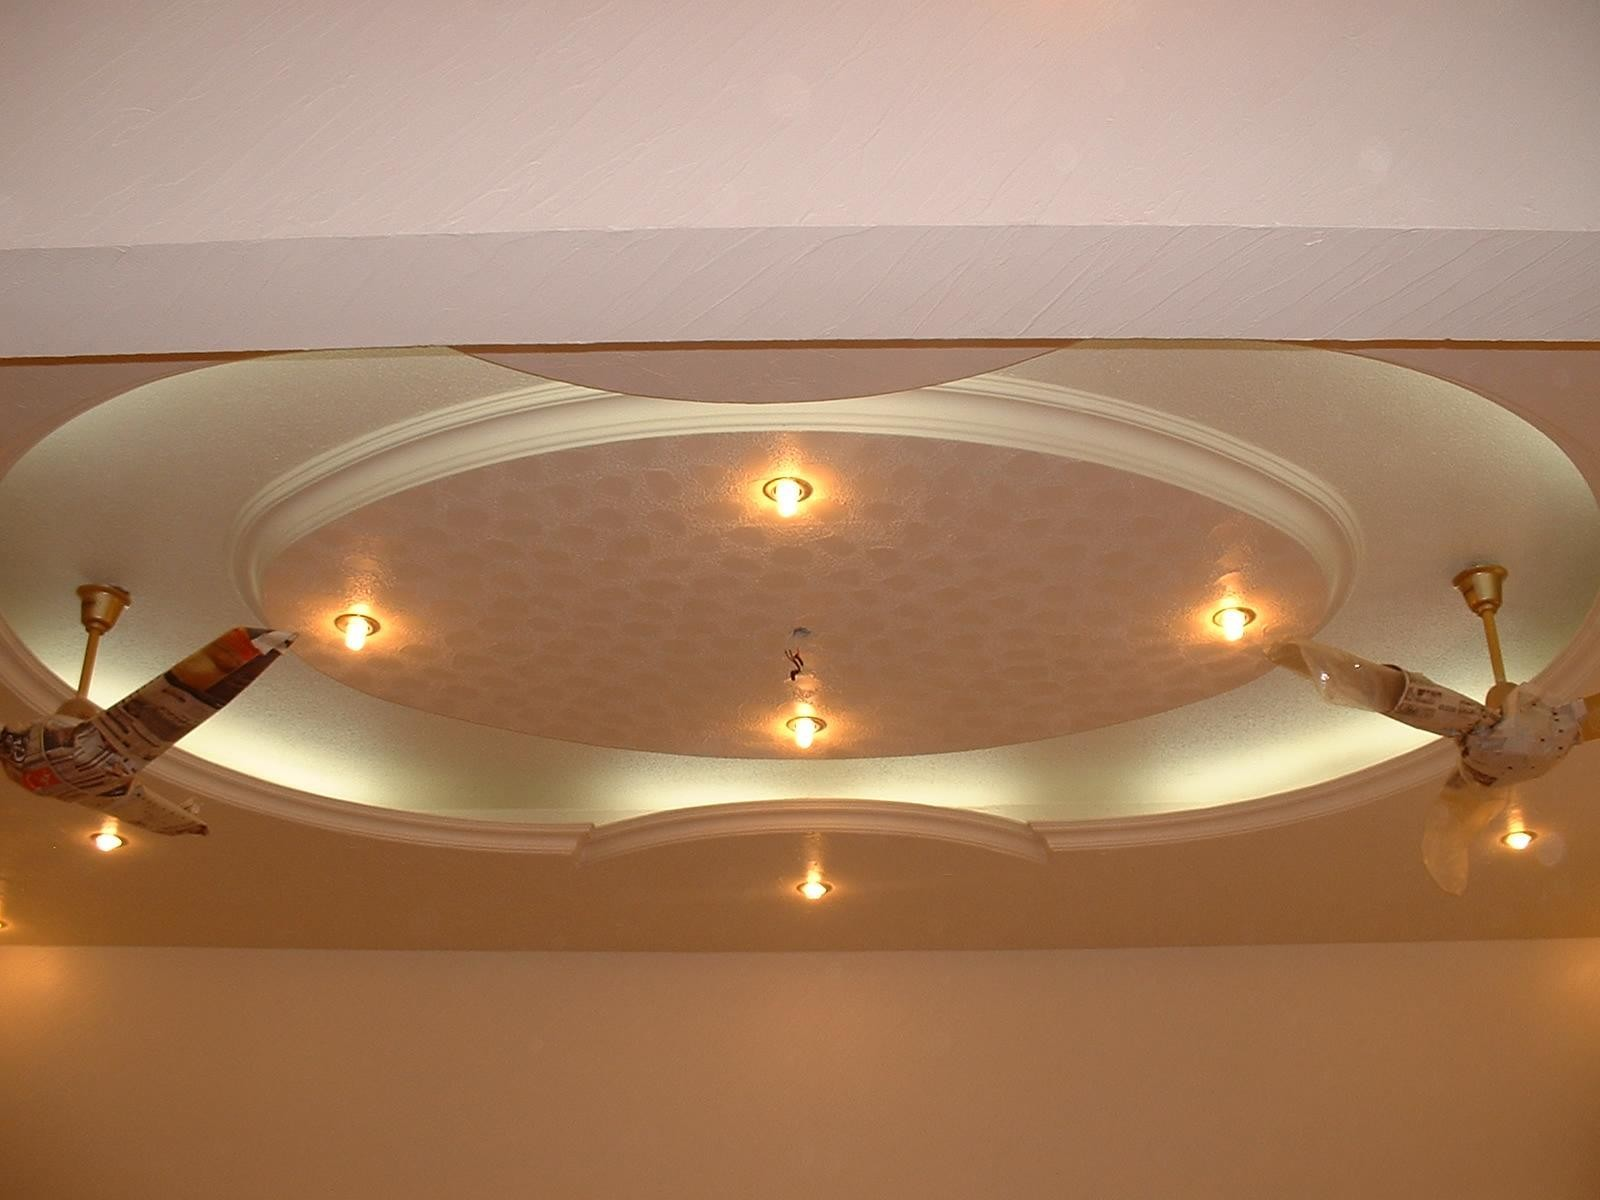 Simple Pop Design For Lobby - Gamboahinestrosa